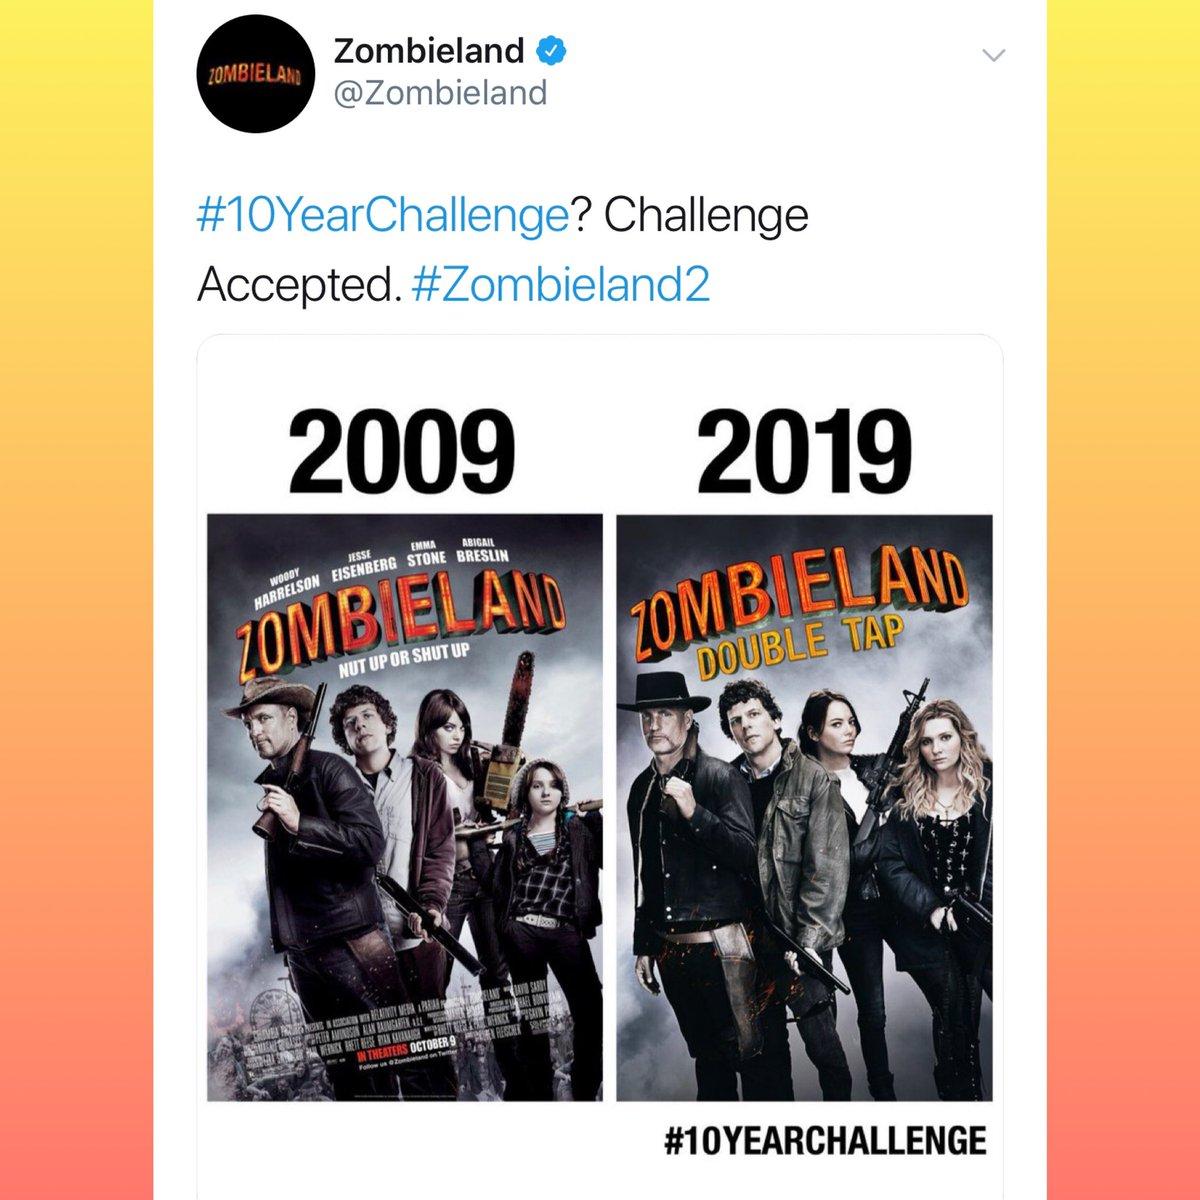 Zombieland2 Hashtag On Twitter